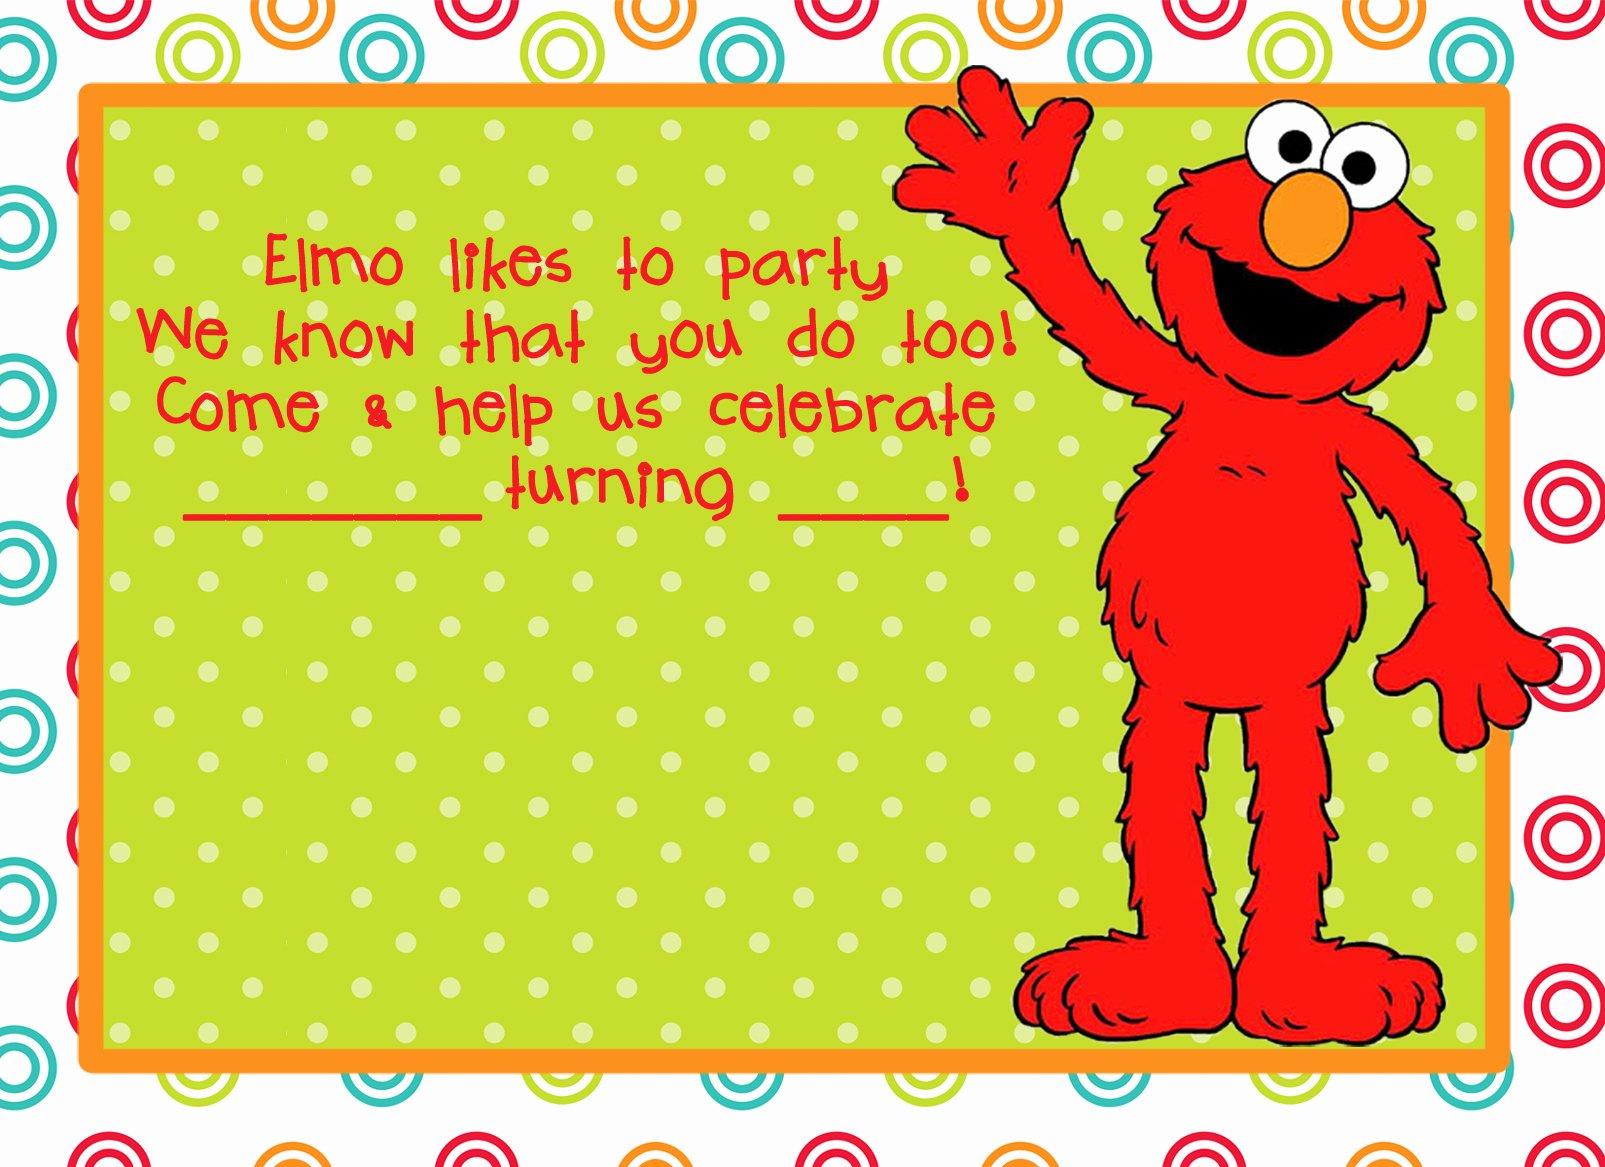 Elmo Birthday Invitation Templates Free Best Of Elmo Birthday Party On Pinterest